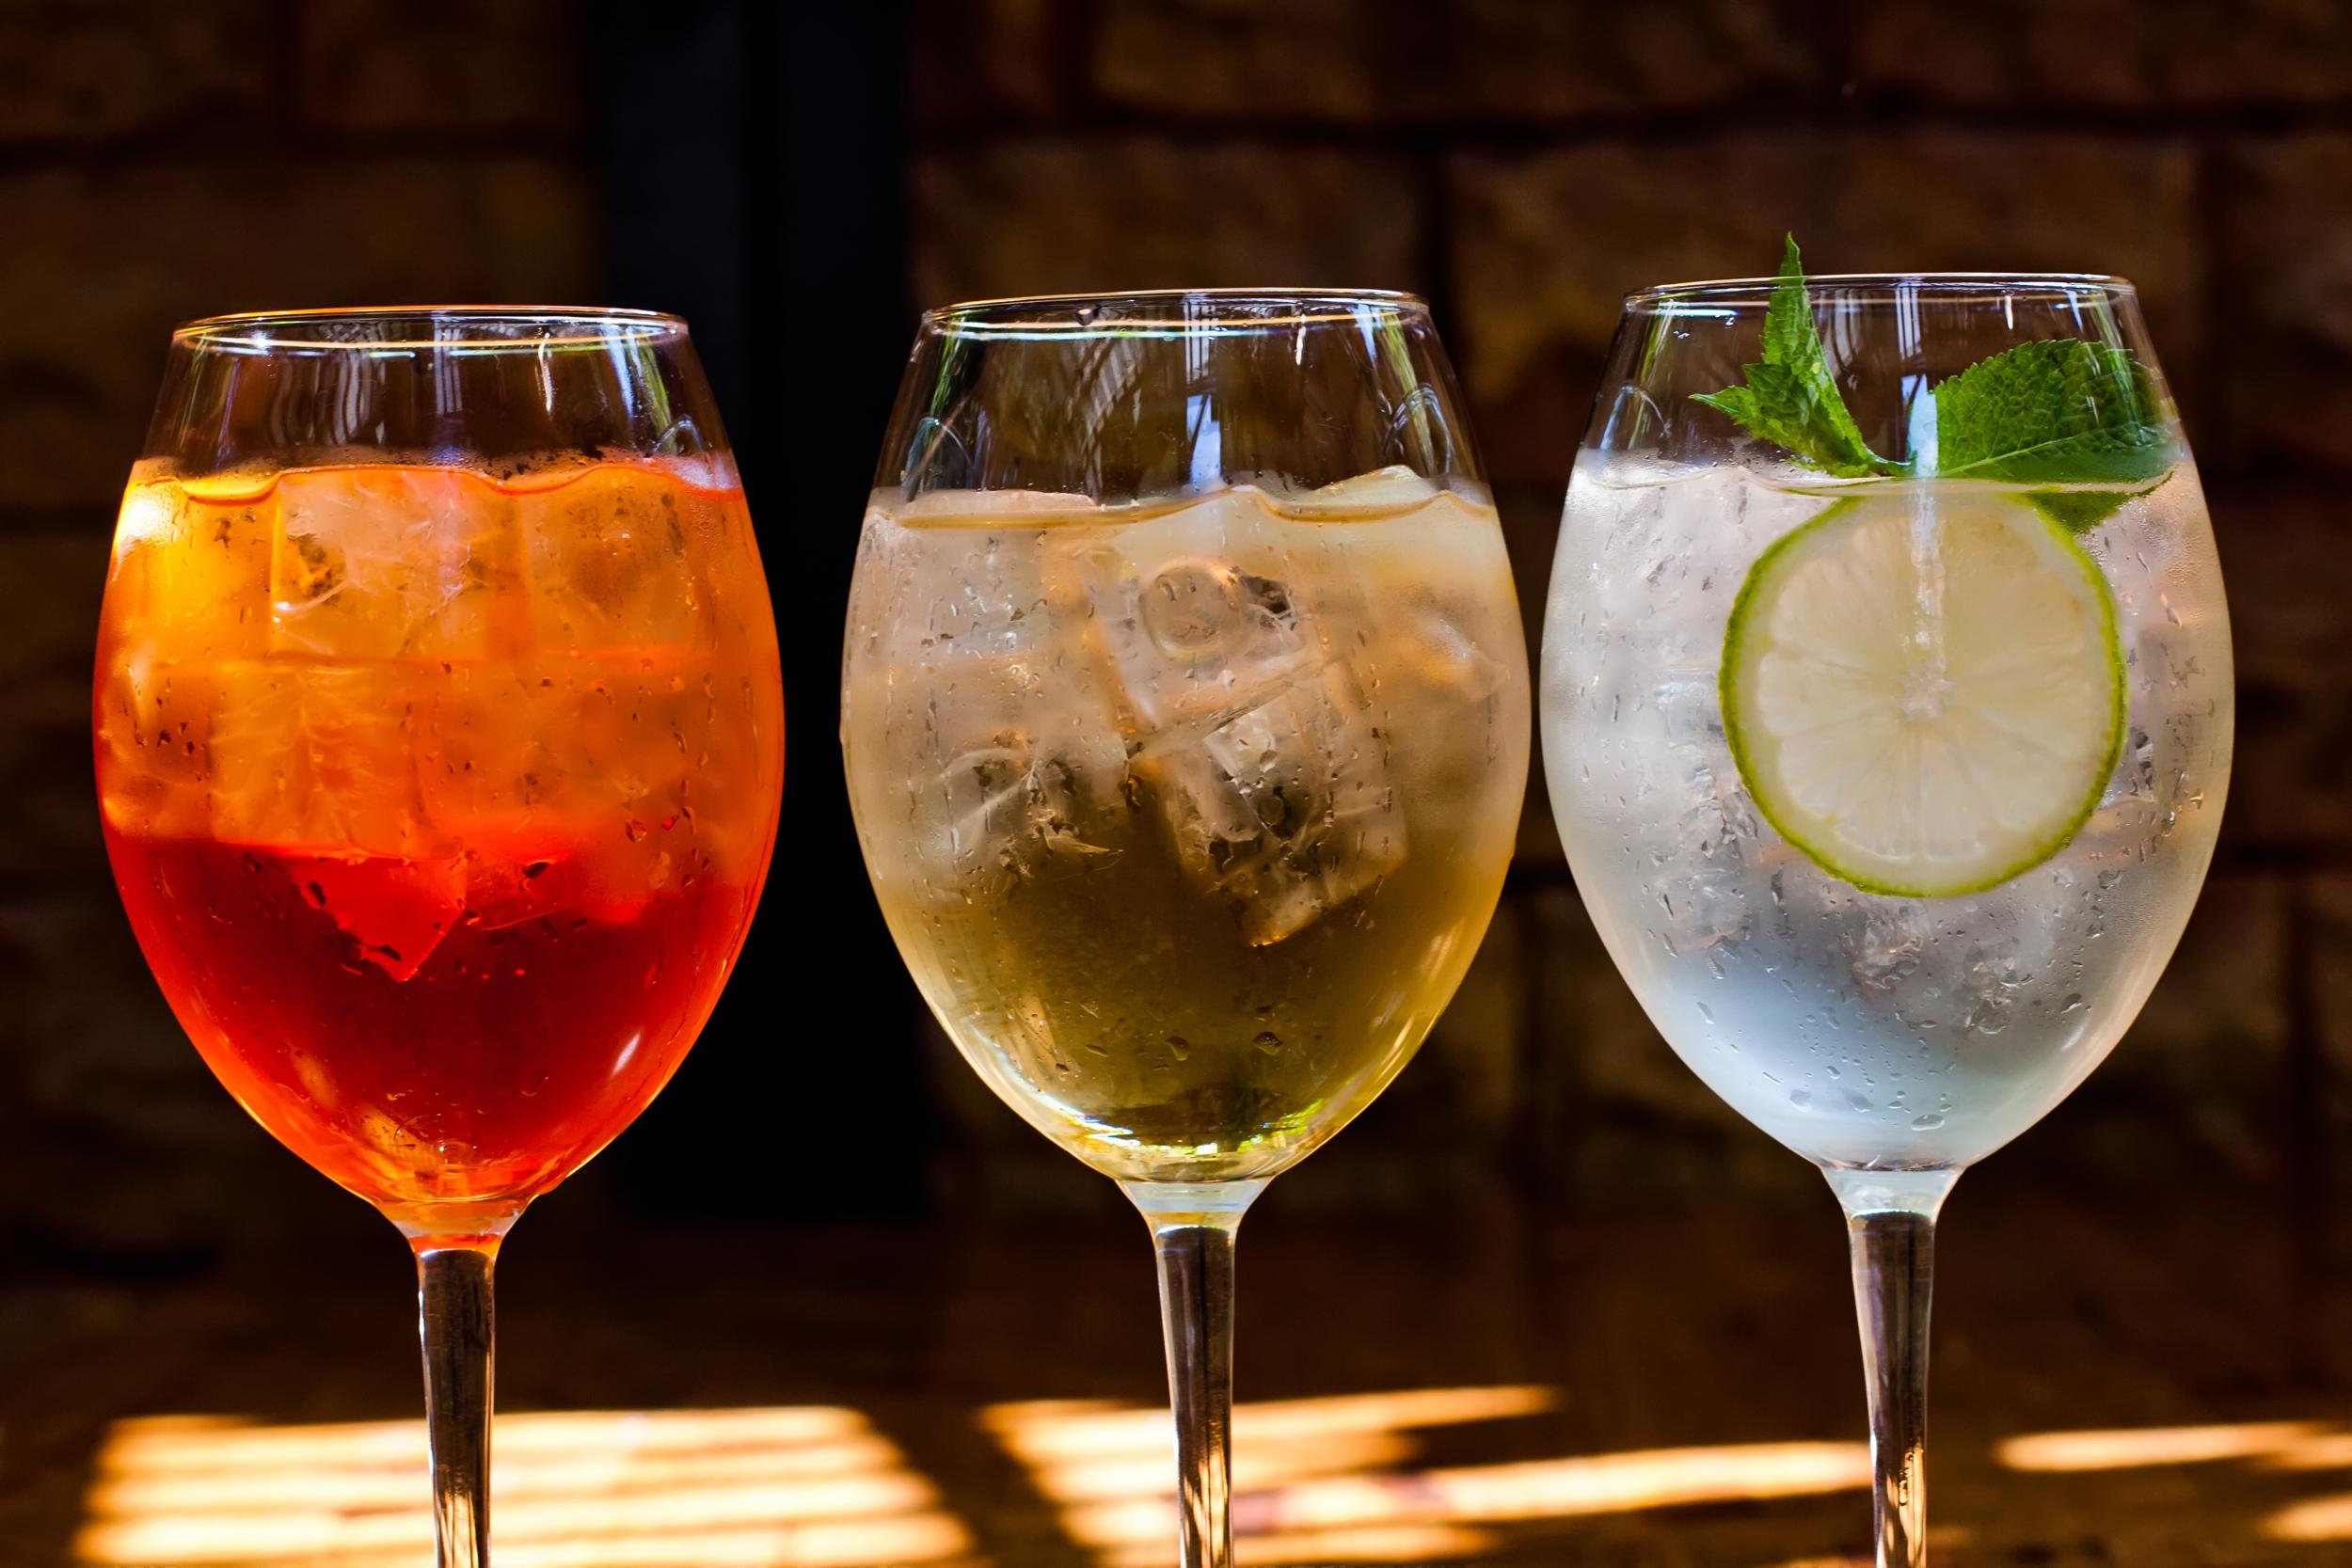 bigstock-Cocktails-with-sparkling-wine-81284396.jpg